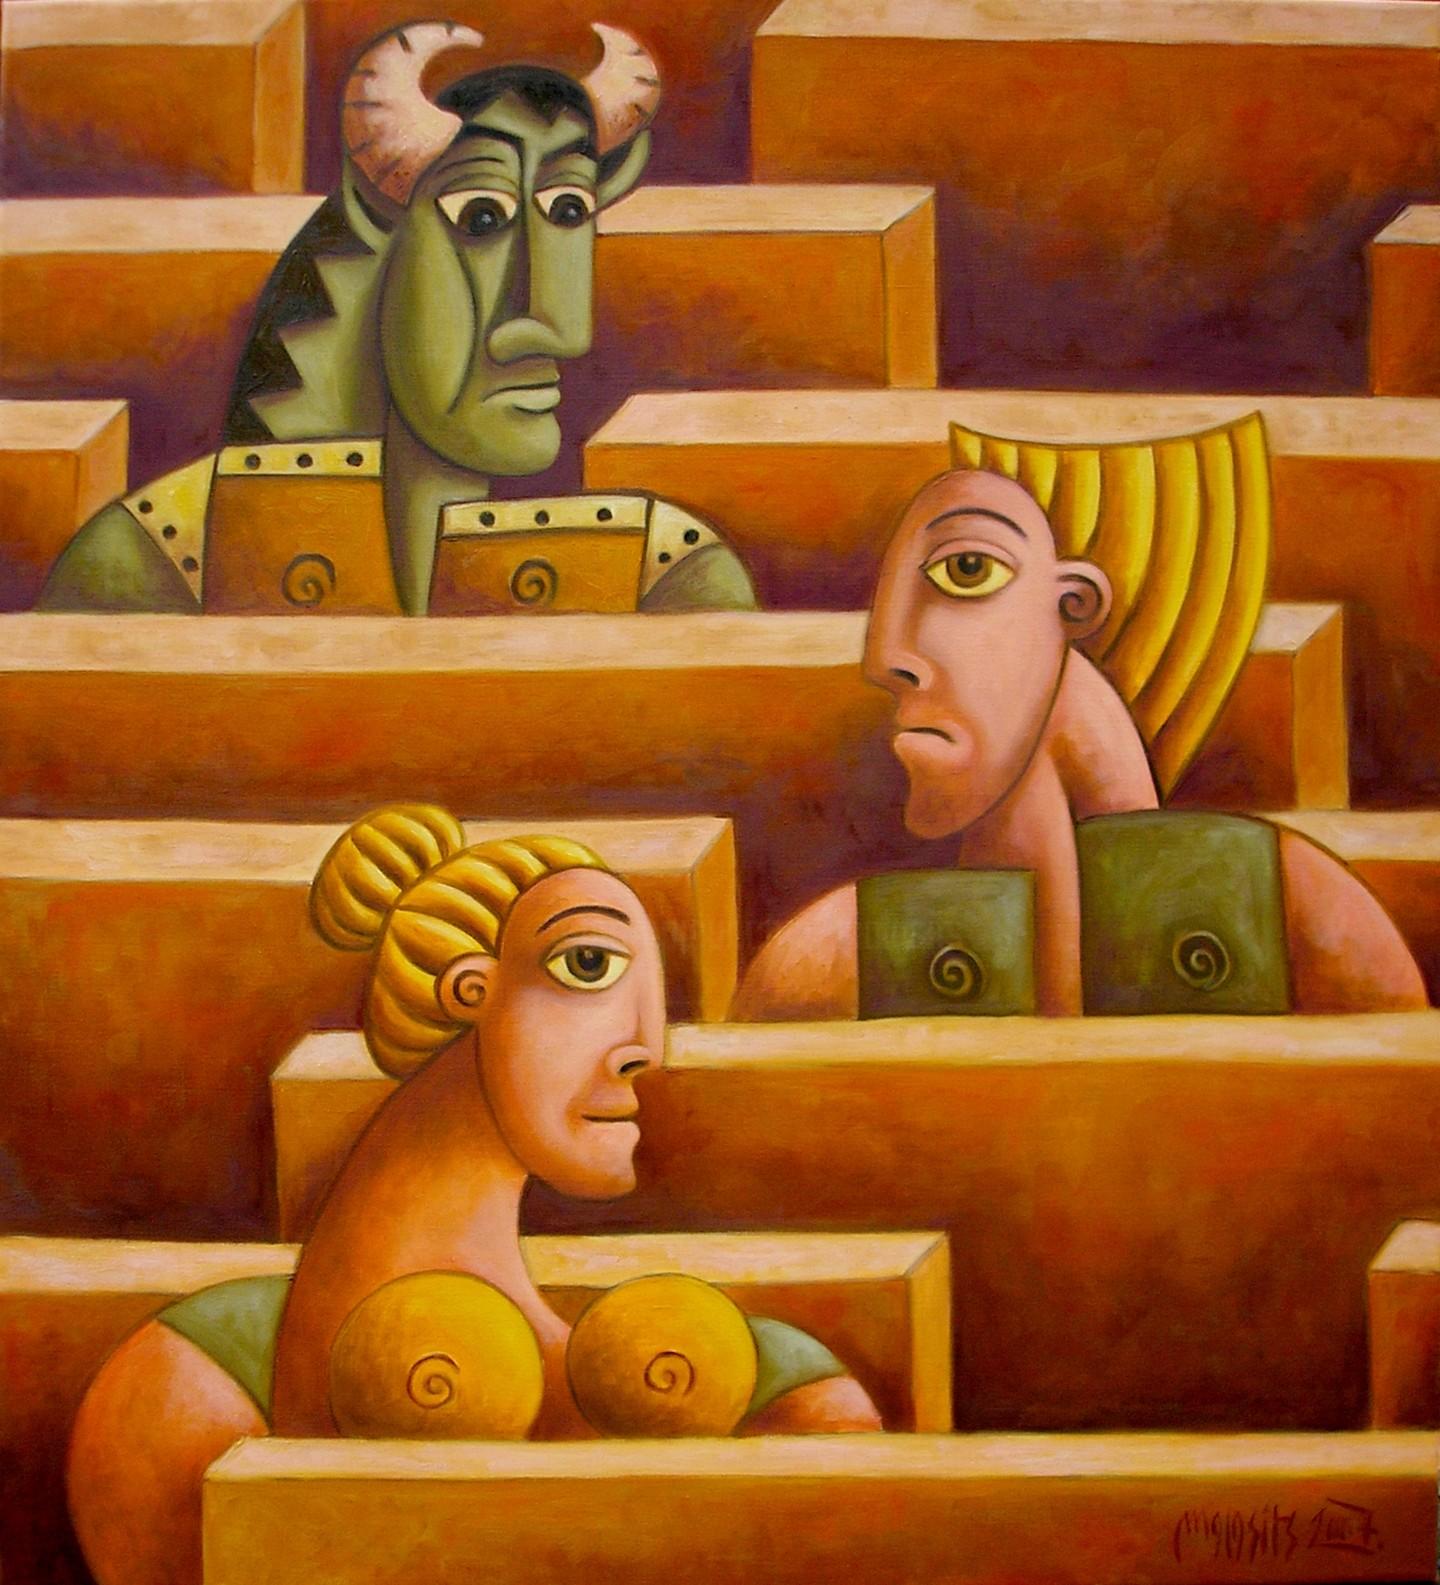 Zsolt Malasits - Labyrinth of life